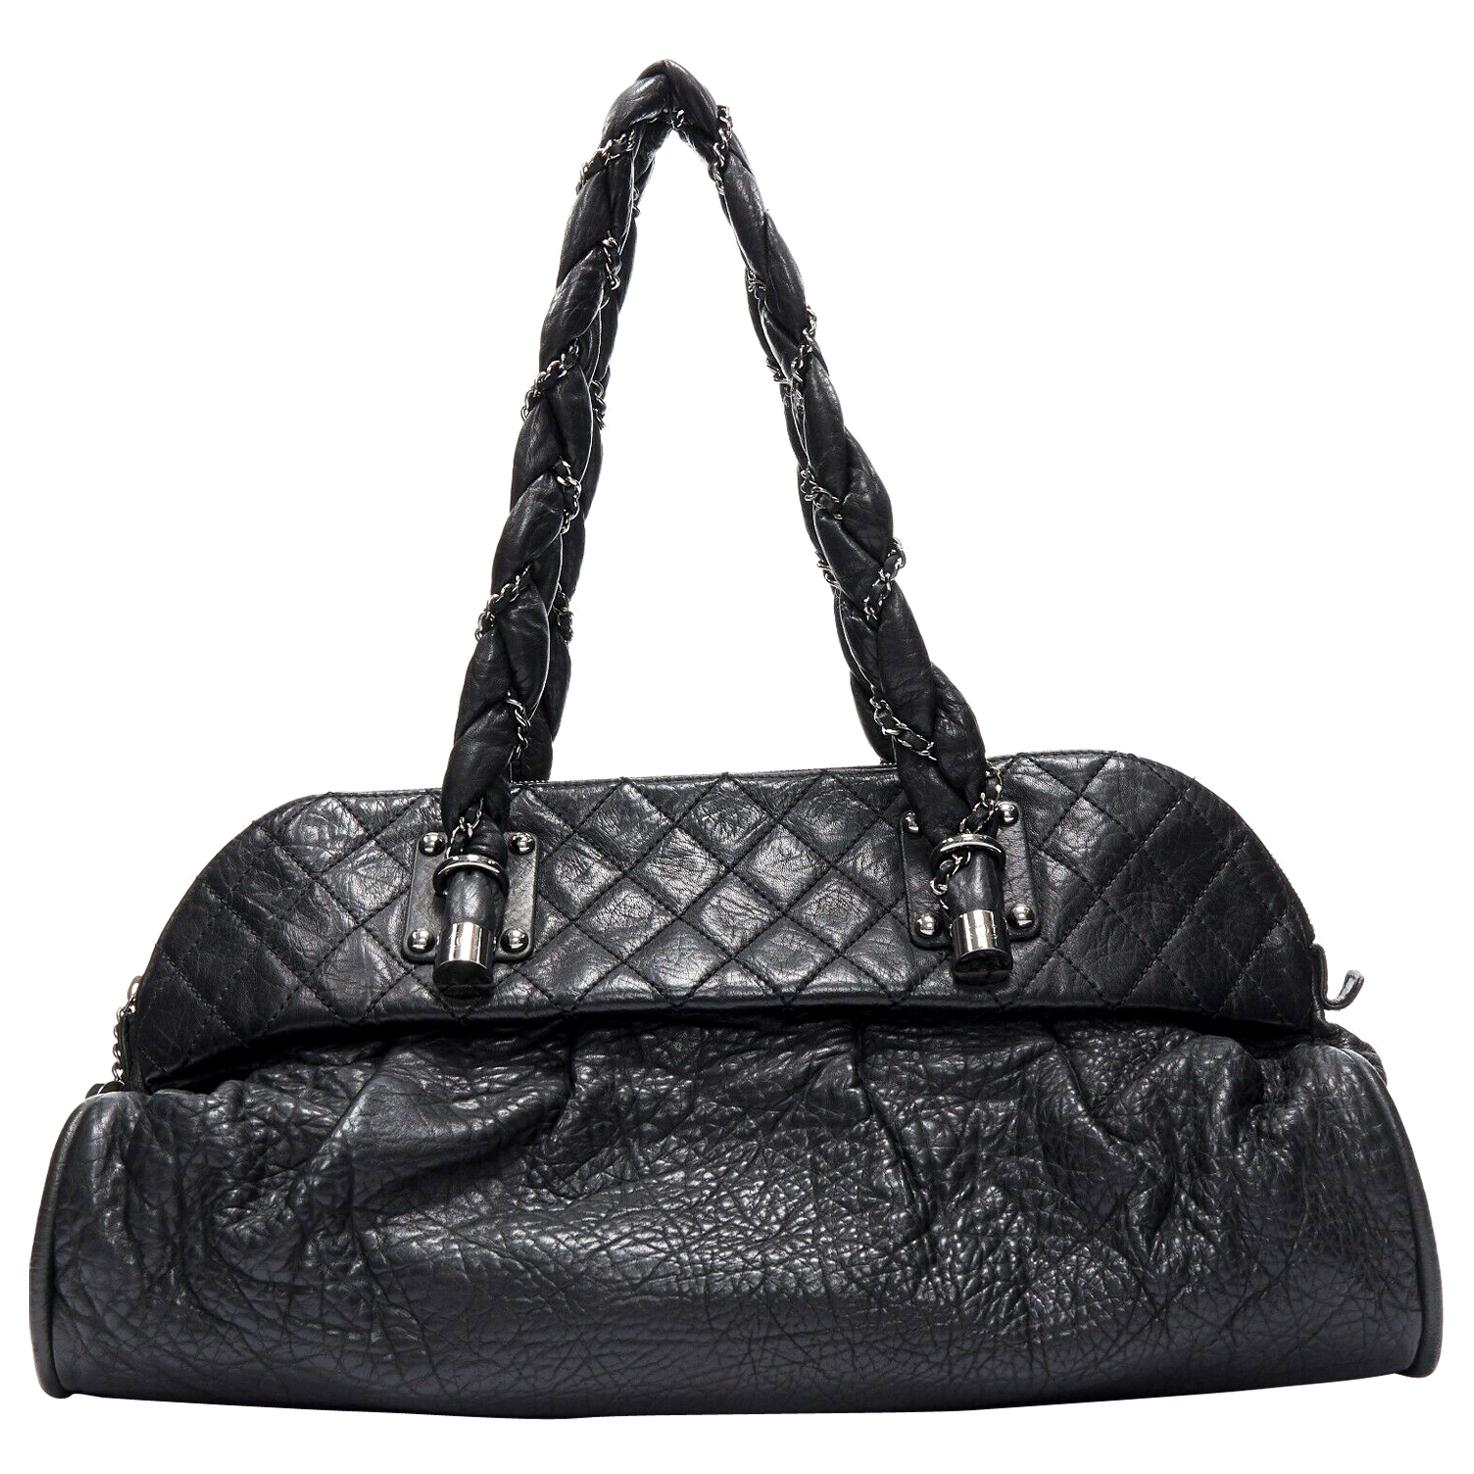 CHANEL black diamond quilted pebbled leather 2.55 braid strap shoulder bag